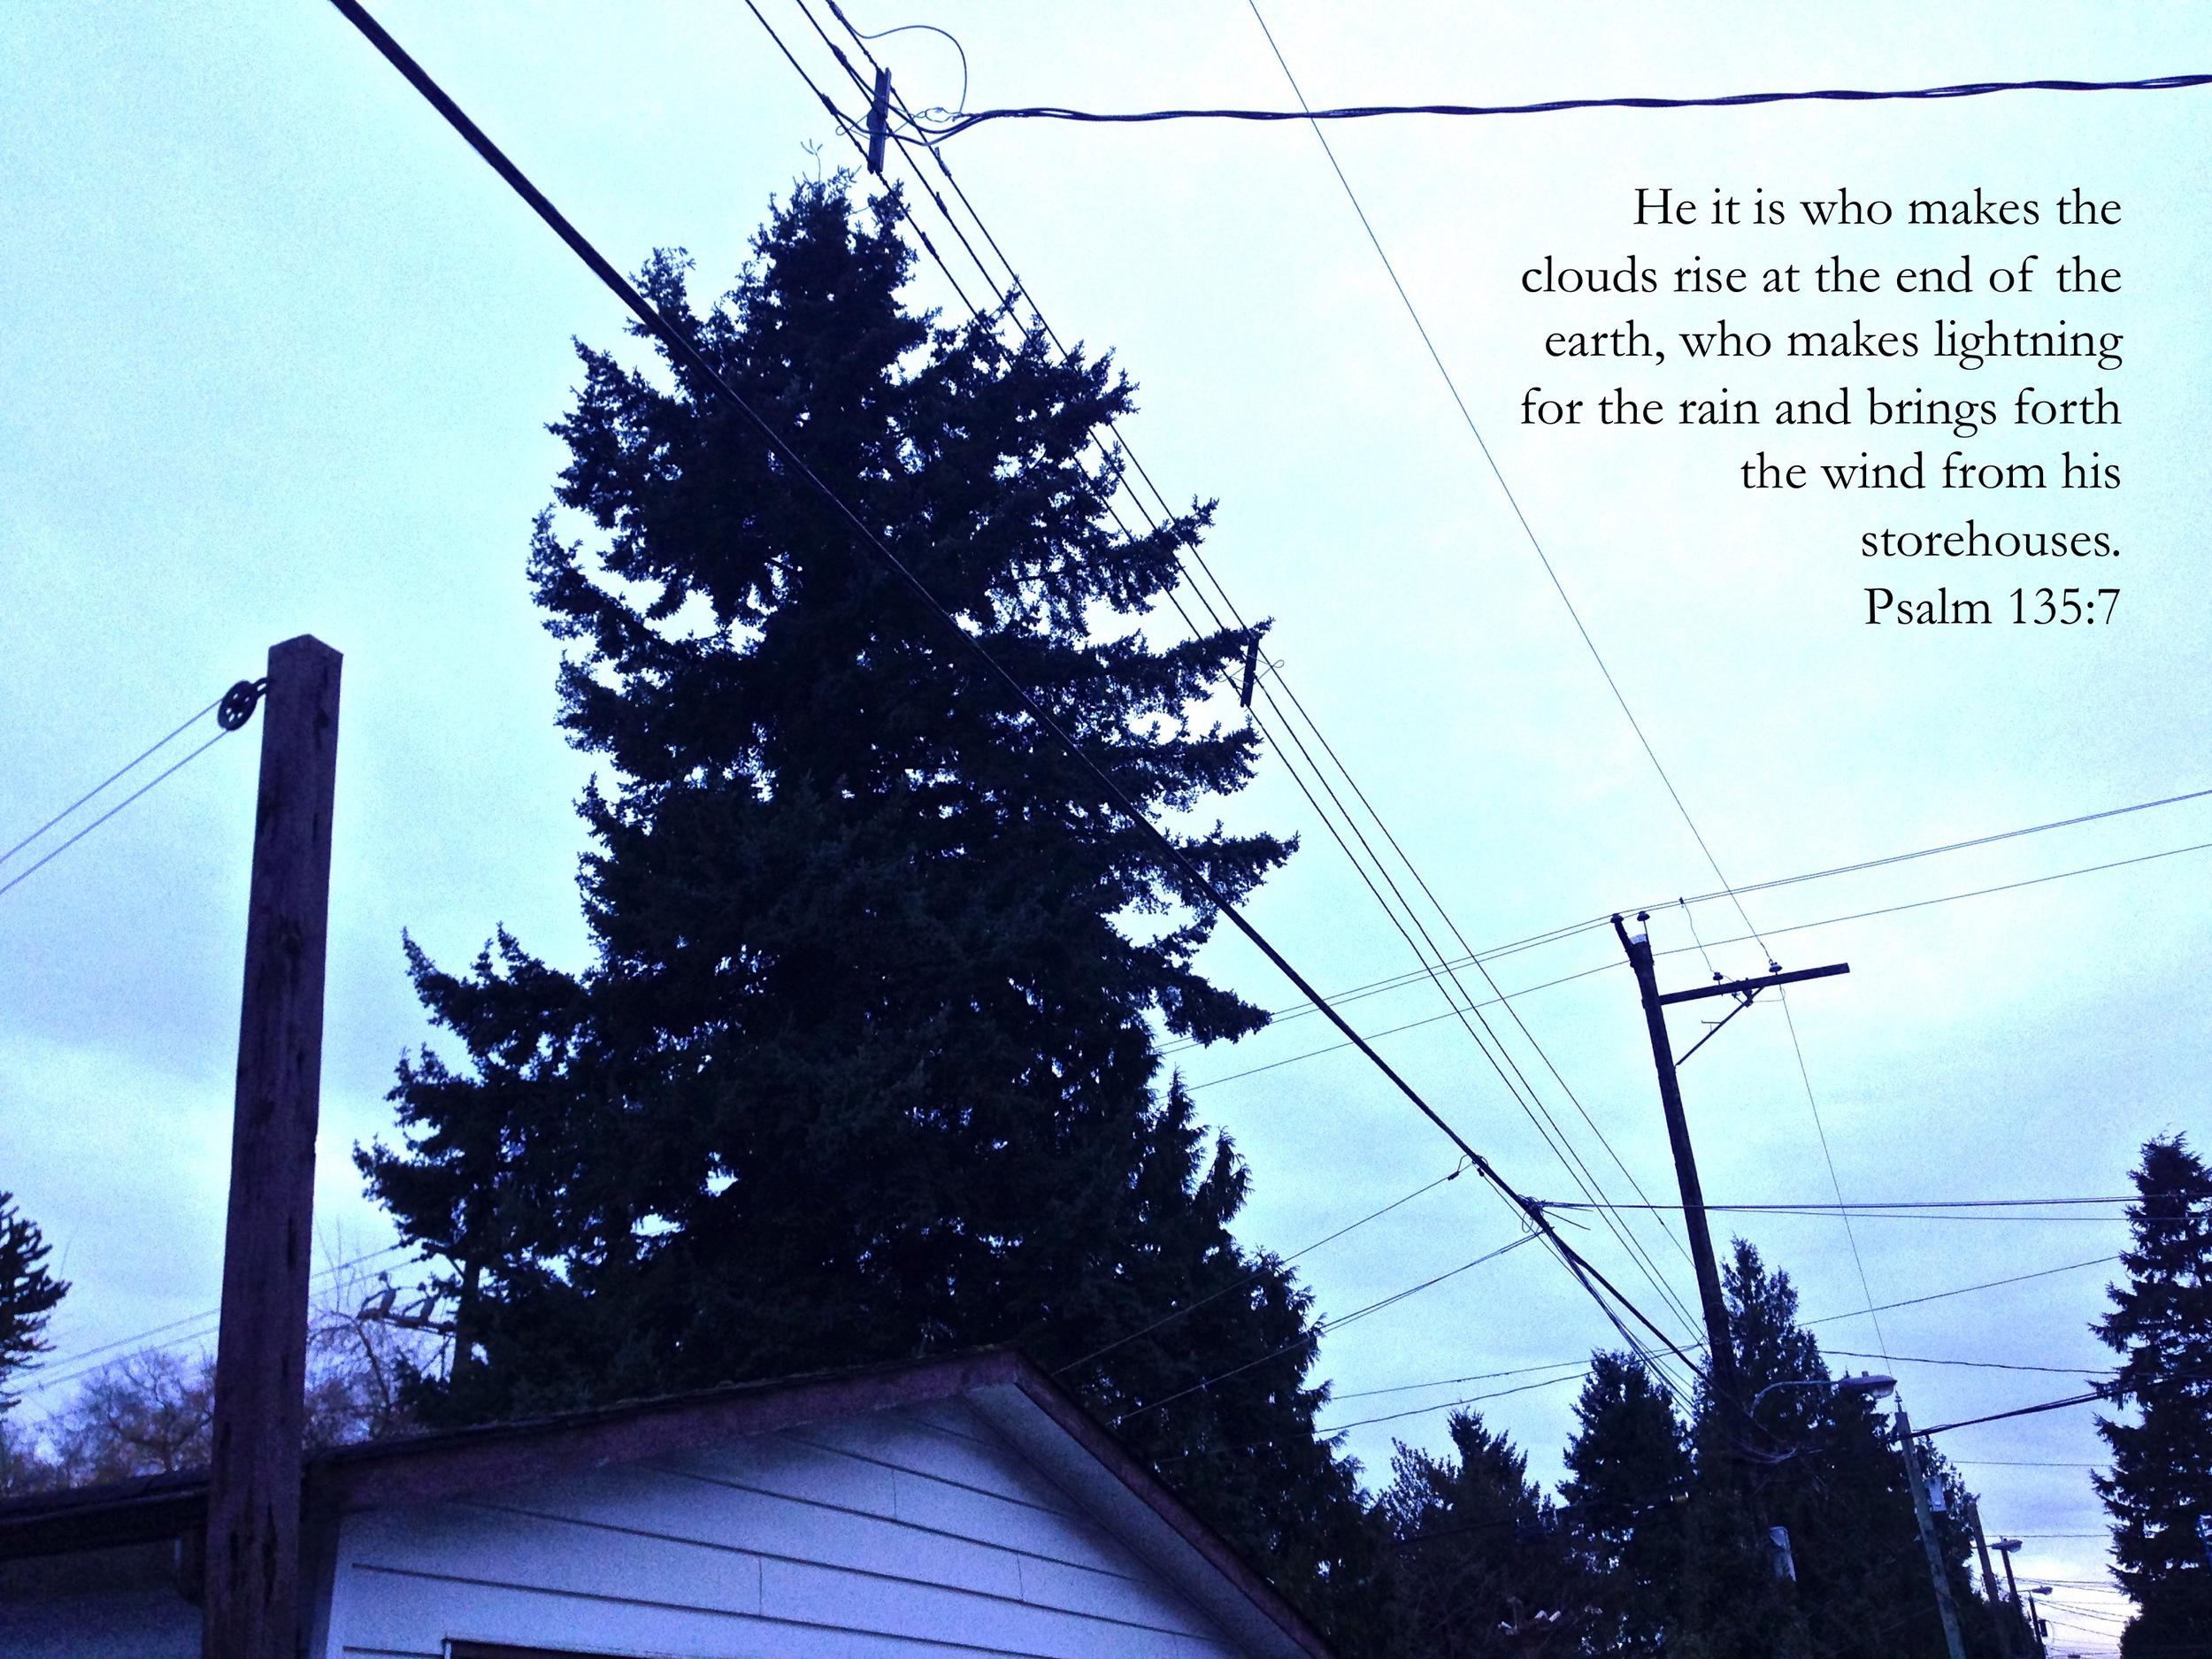 Psalm 135 via nadinewouldsay